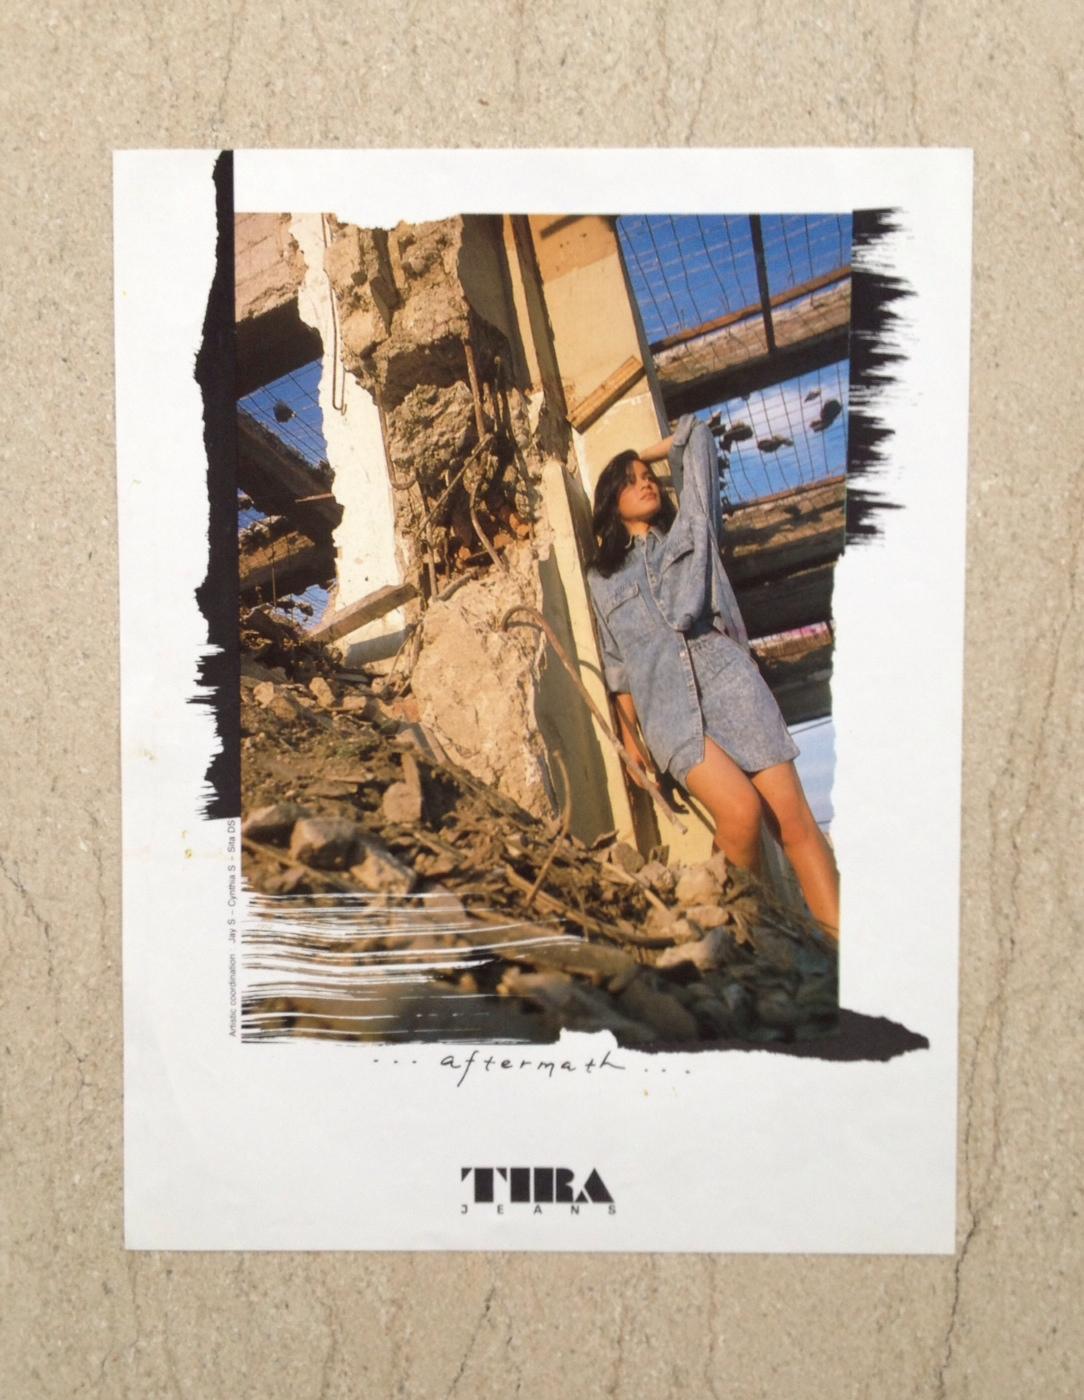 Iklan Tira (1987) Ini adalah iklan pertama pada tahun tersebut yang berani menampilkan hanya logo tanpa alamat-alamat outlet yang biasanya memenuhi bagian bawah iklan.